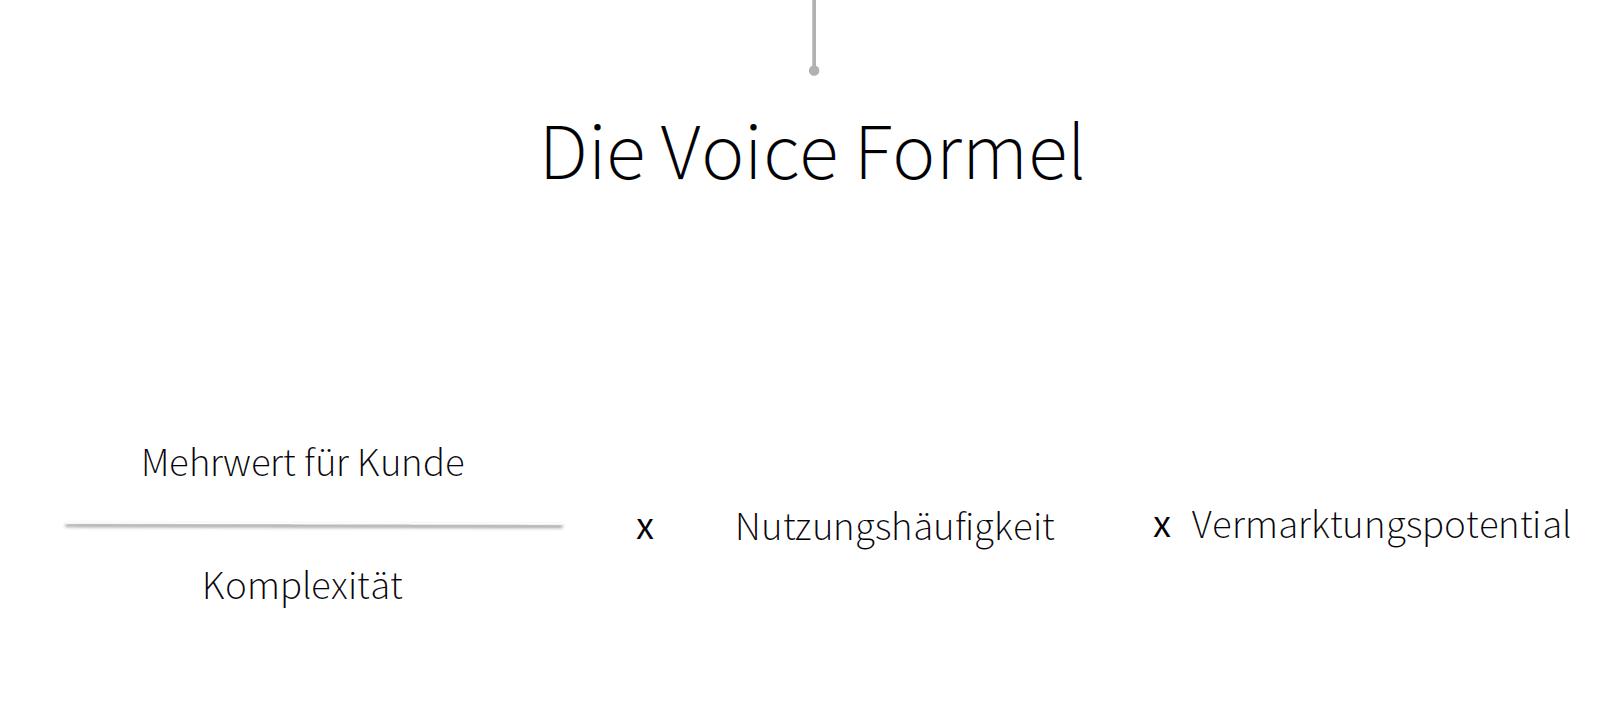 Voice Formel Malte Kosub